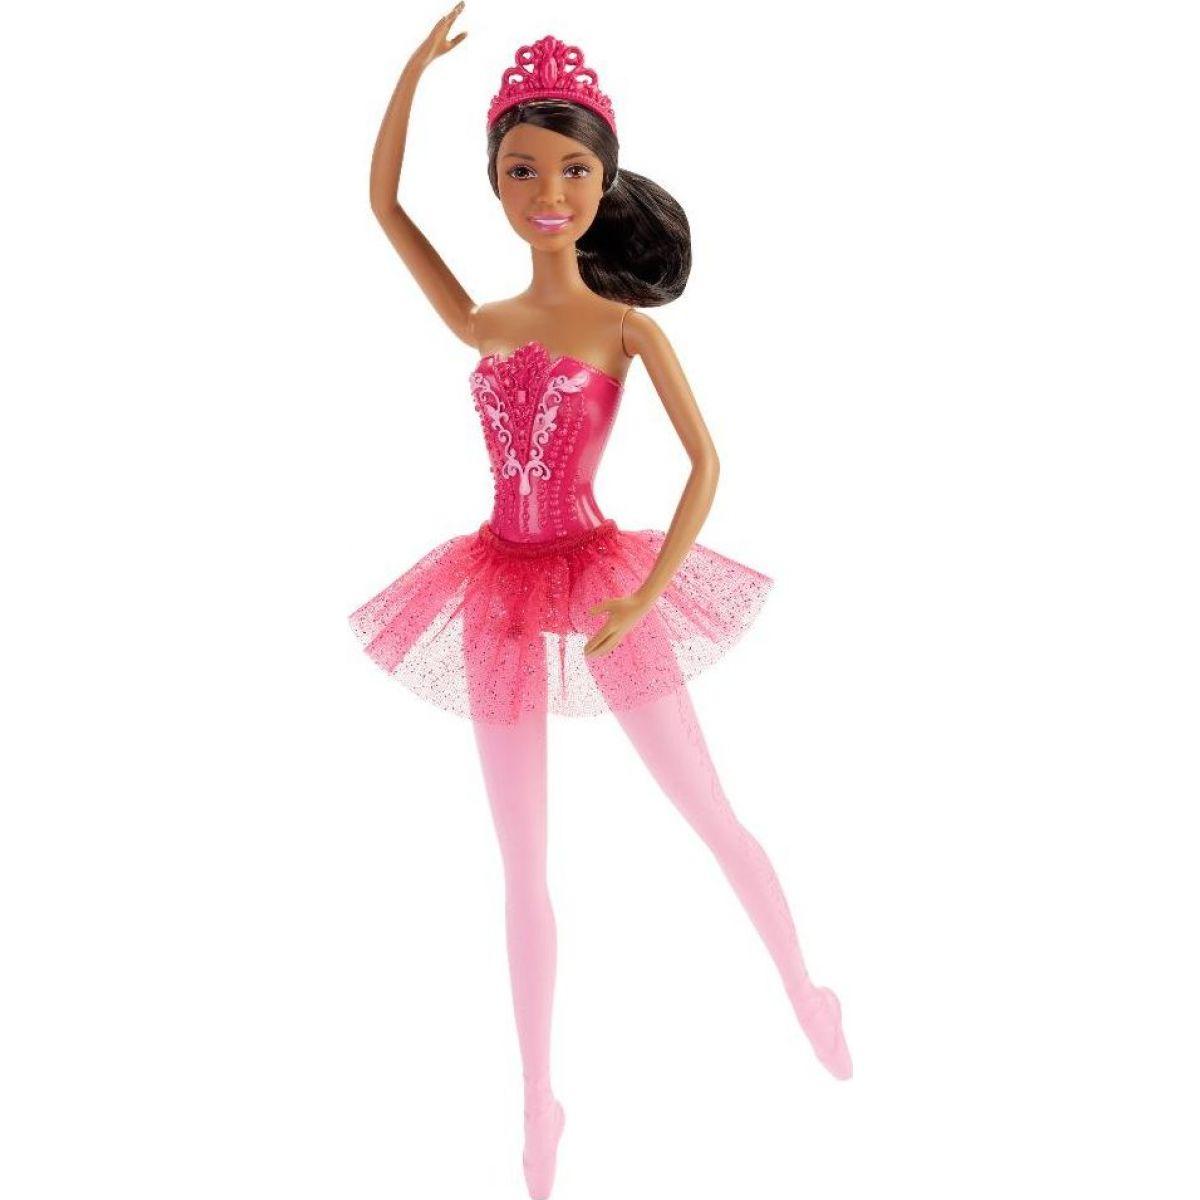 Barbie Panenka balerína brunetka růžové šaty